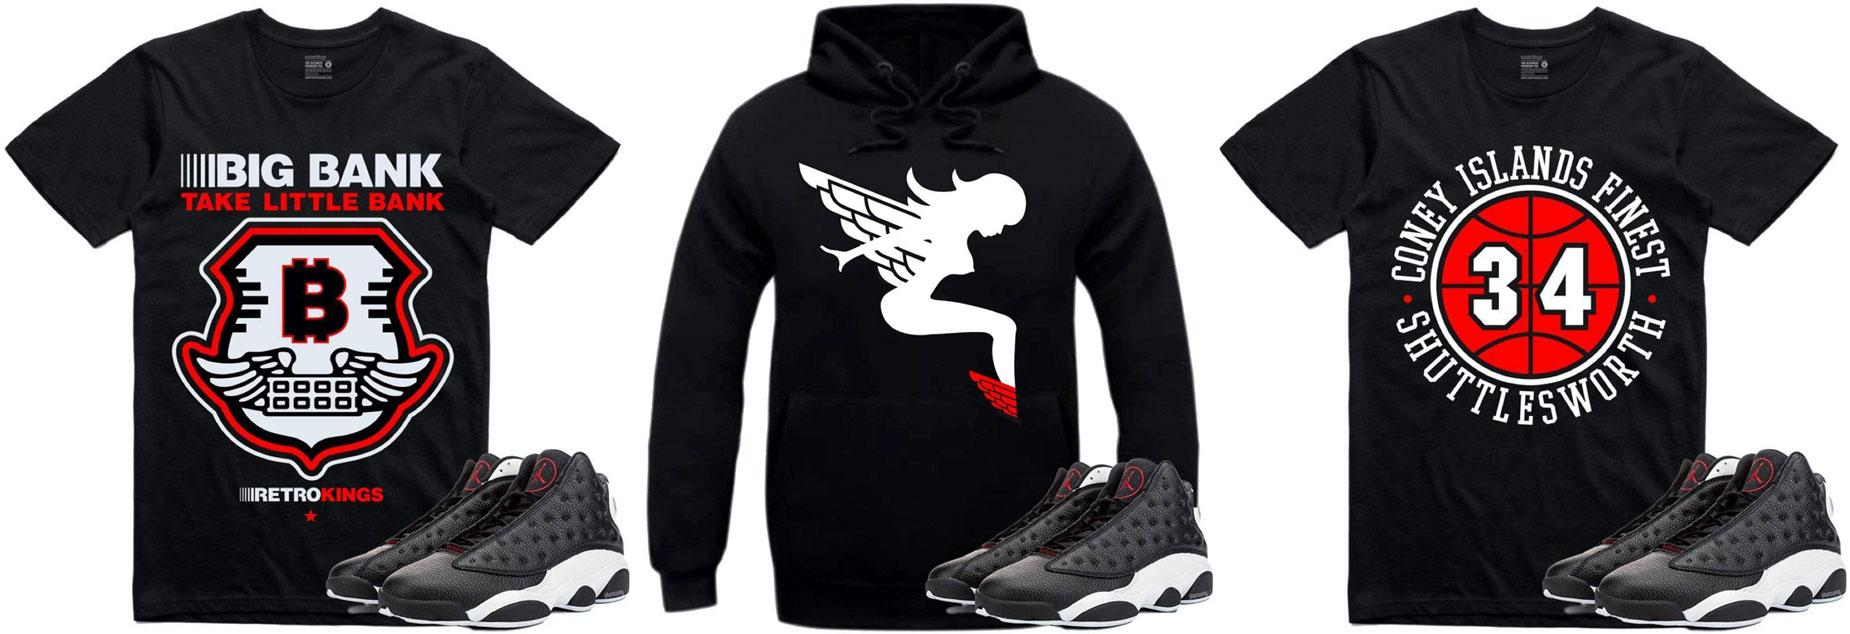 jordan-13-reverse-he-got-game-sneaker-clothing-retro-kings